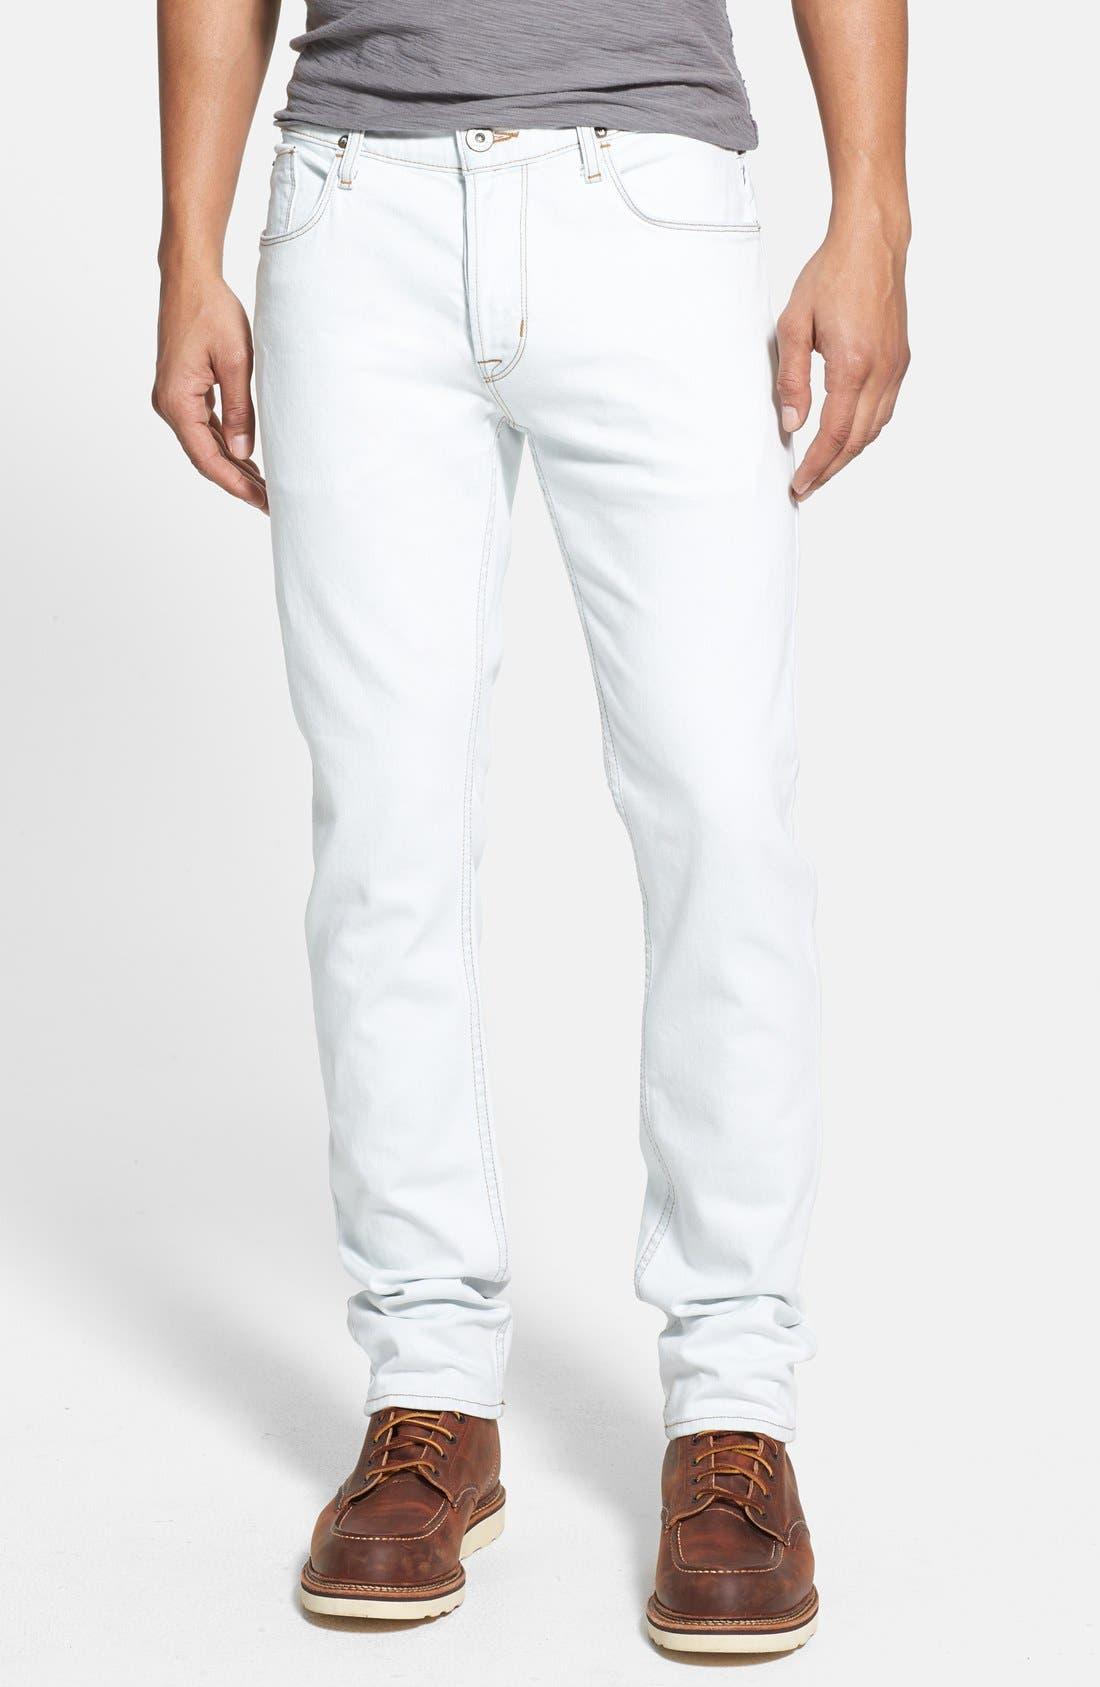 Alternate Image 1 Selected - Hudson Jeans 'Sartor' Slouchy Skinny Fit Jeans (Flashback)